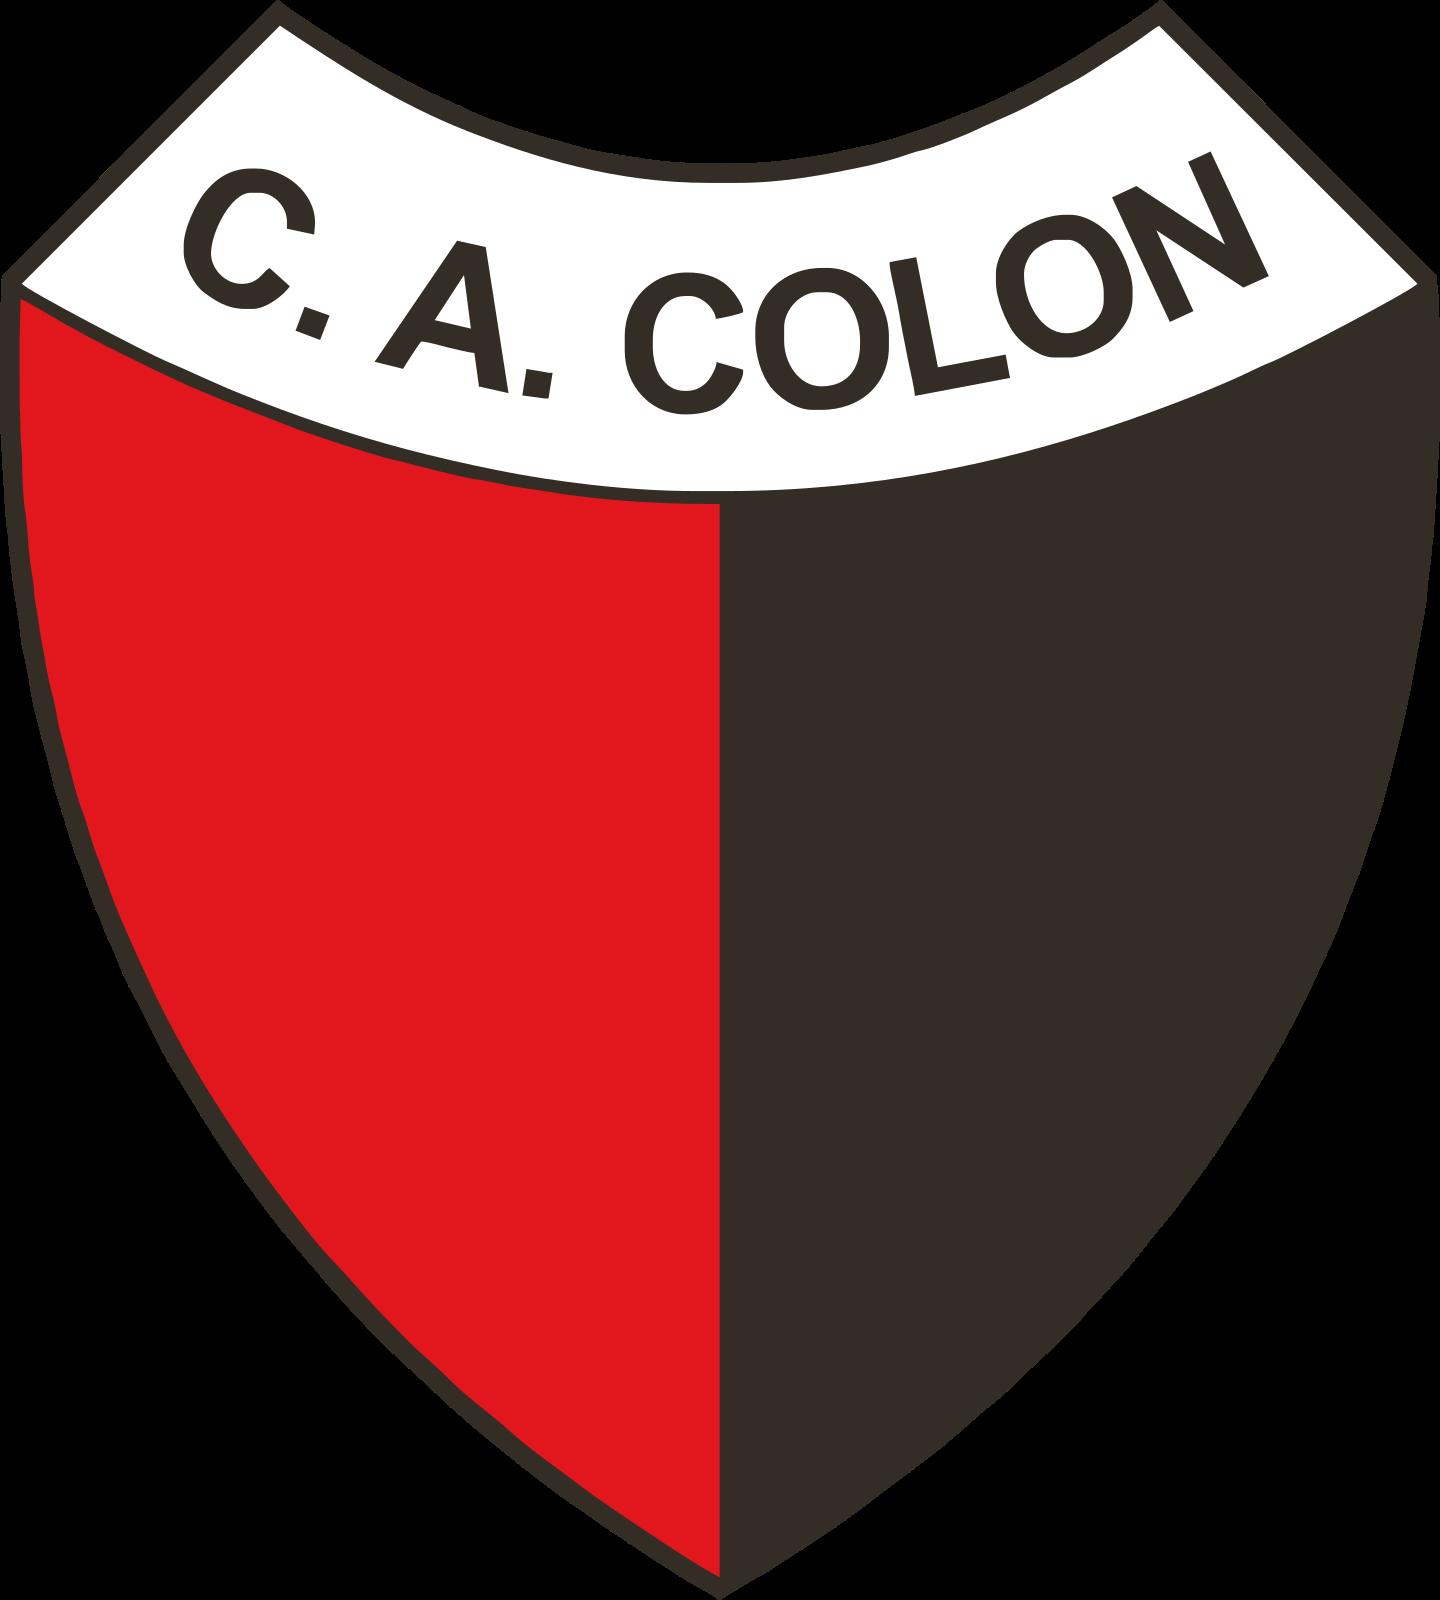 c a colon logo 2 - Club Atlético Colón Logo